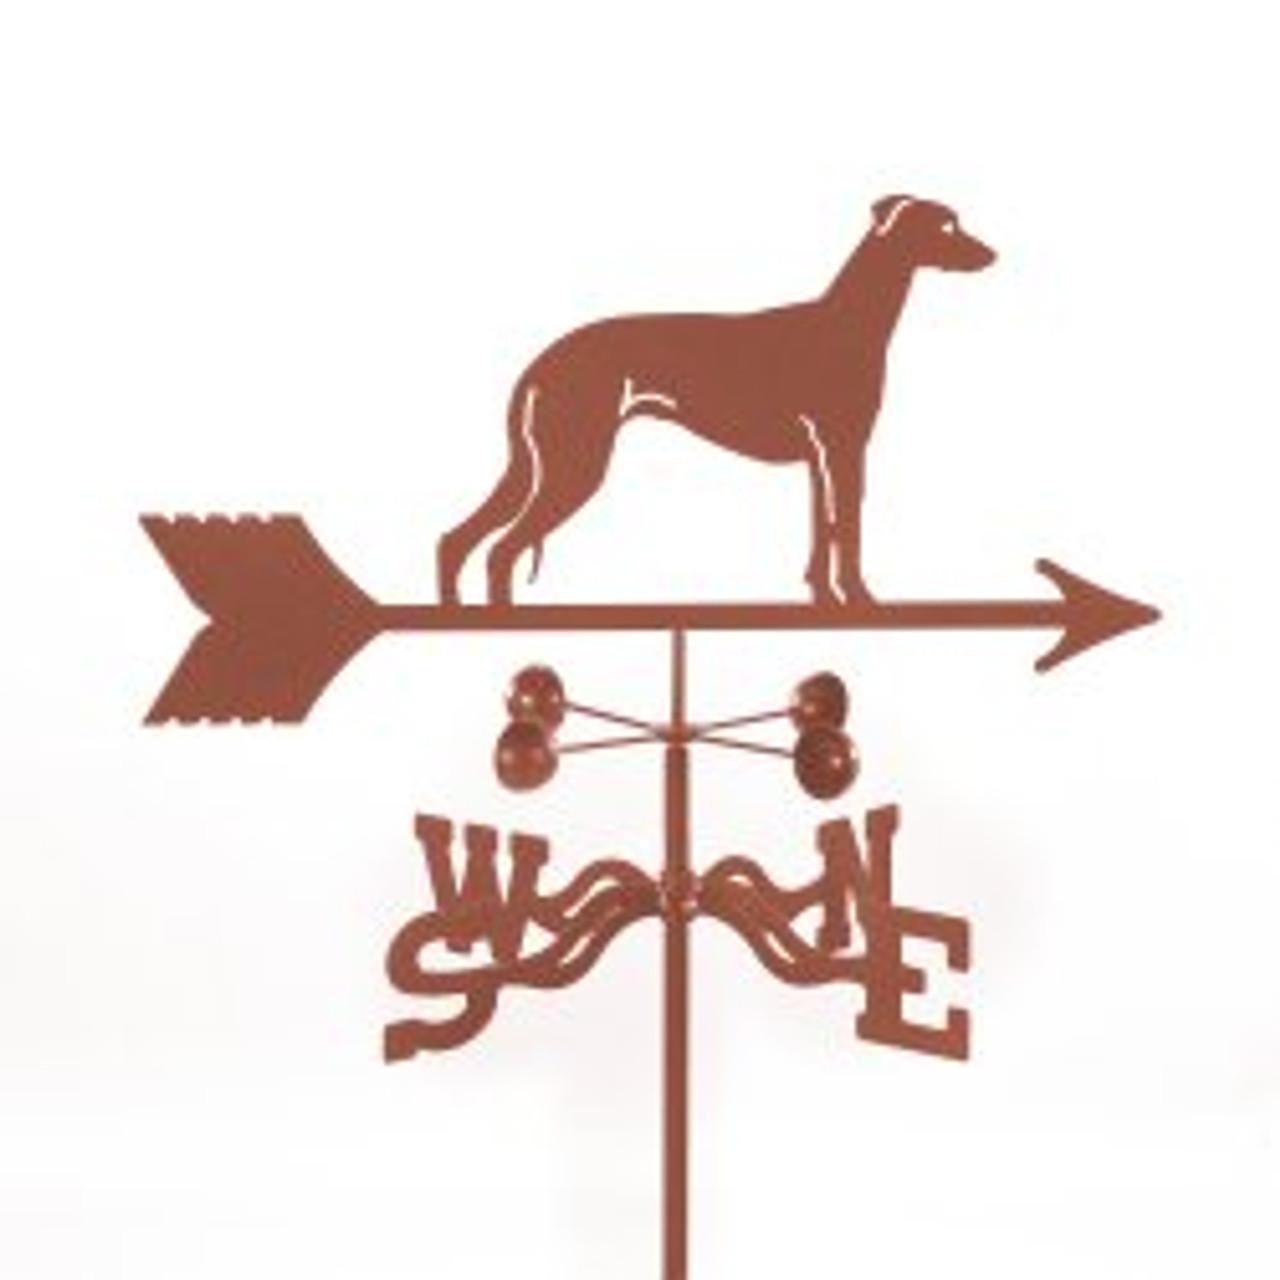 Dog-Greyhound Weathervane with mount